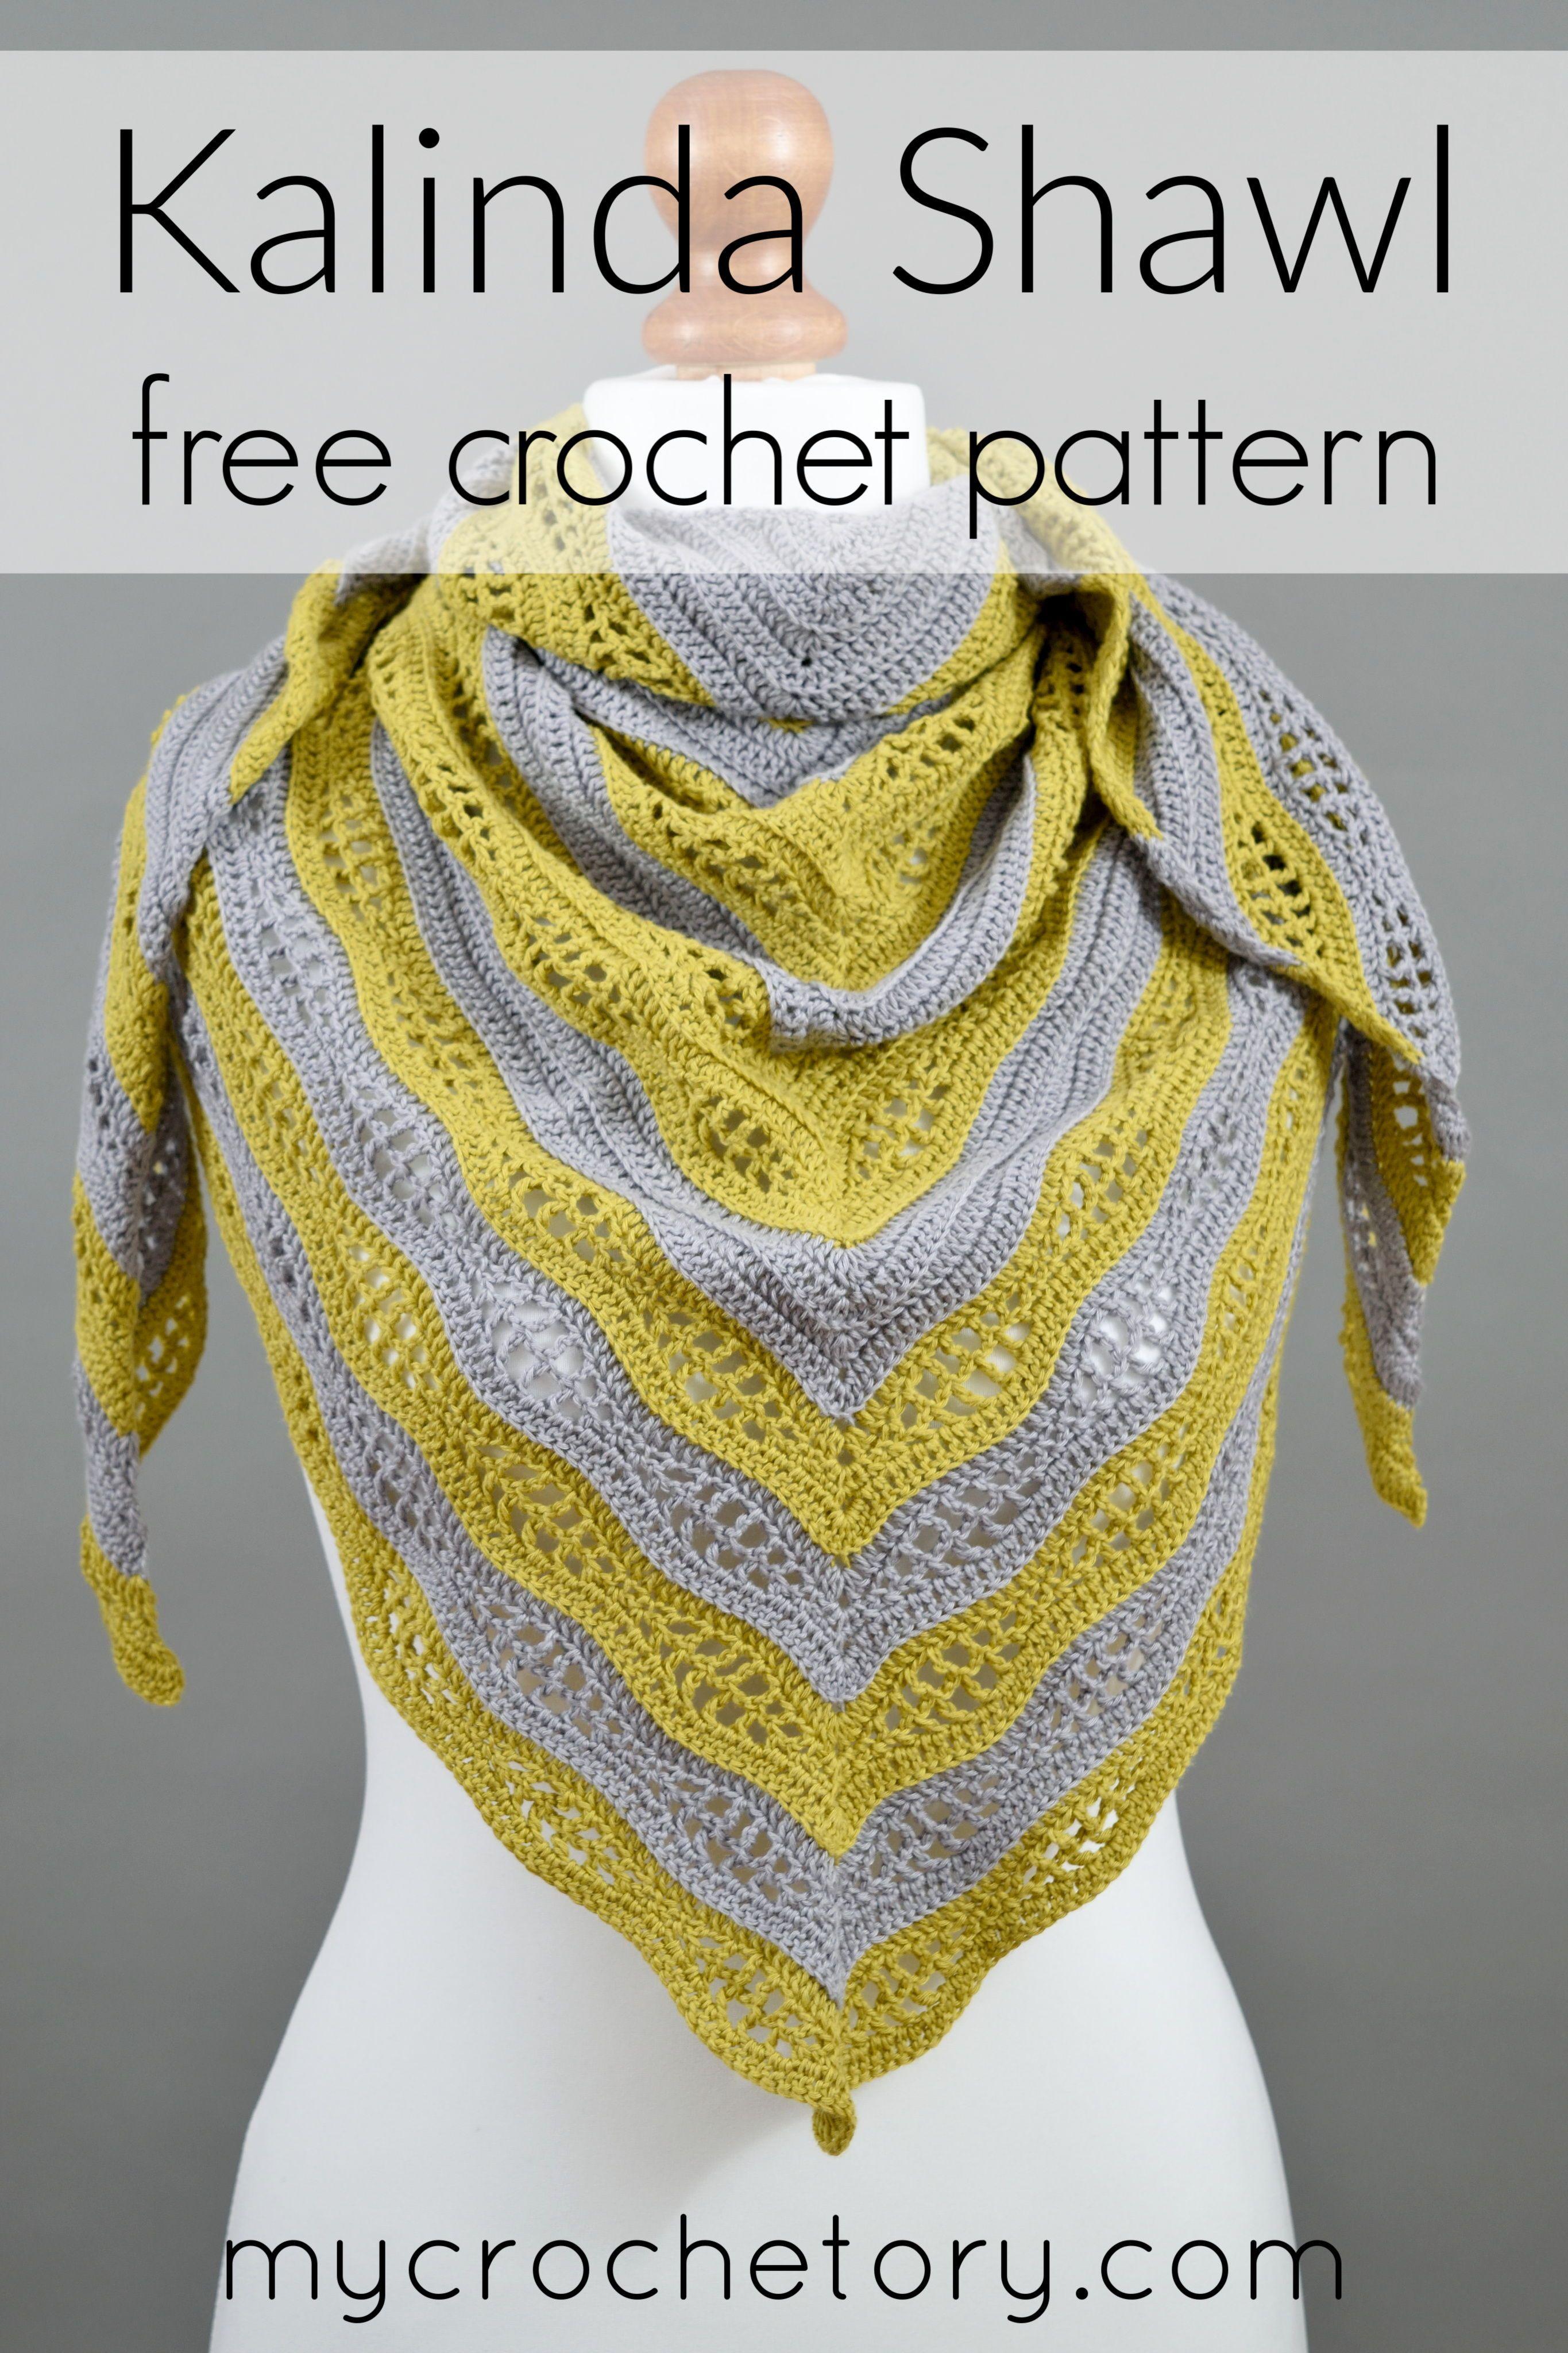 Kalinda Shawl - free crochet pattern by MyCrochetory